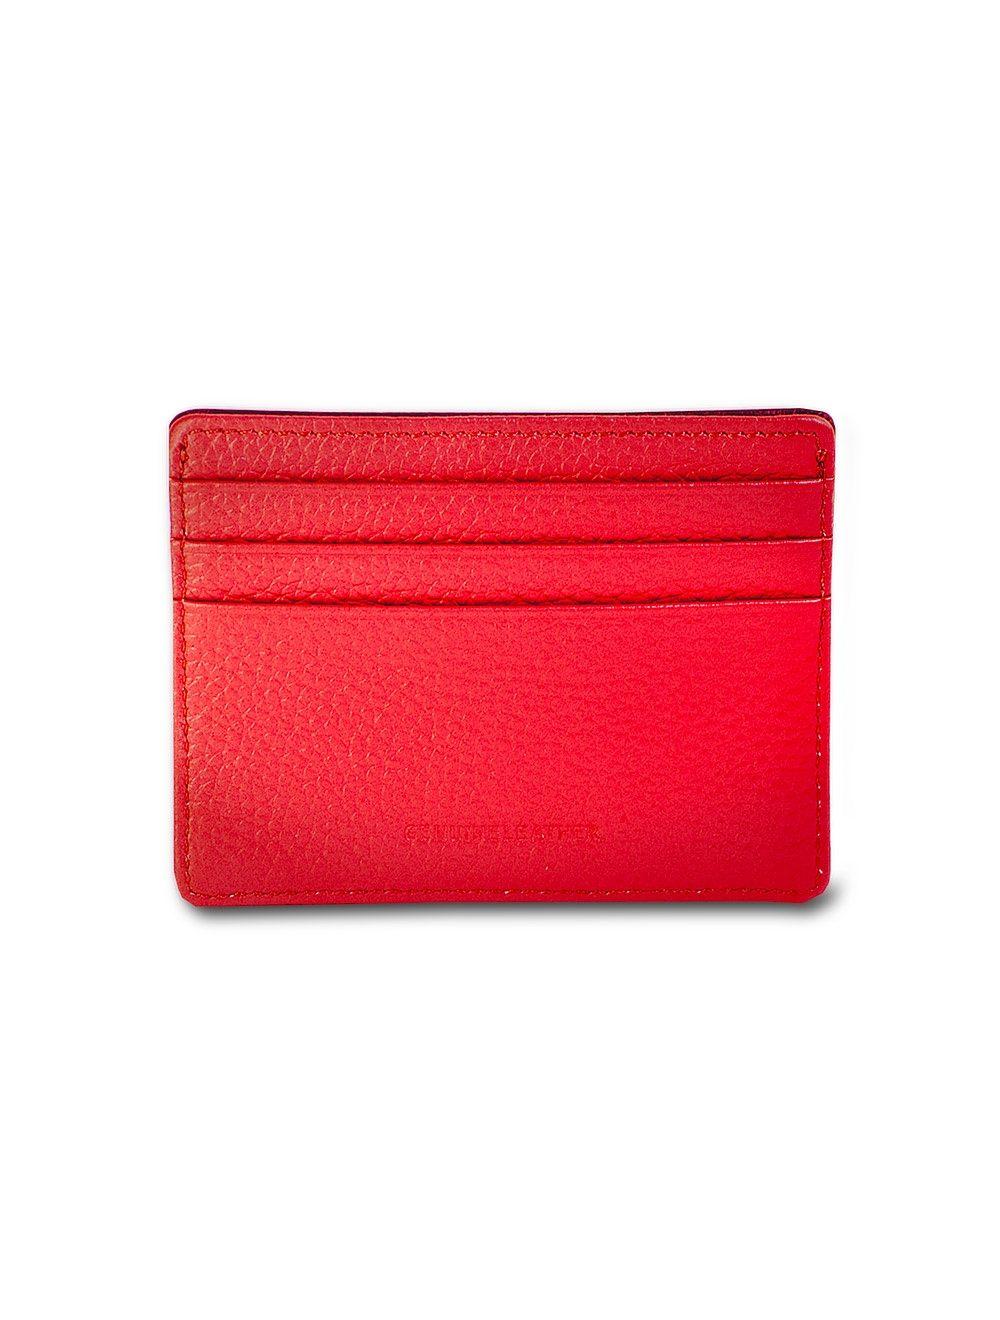 Cambridge Wallet - Cherry Red